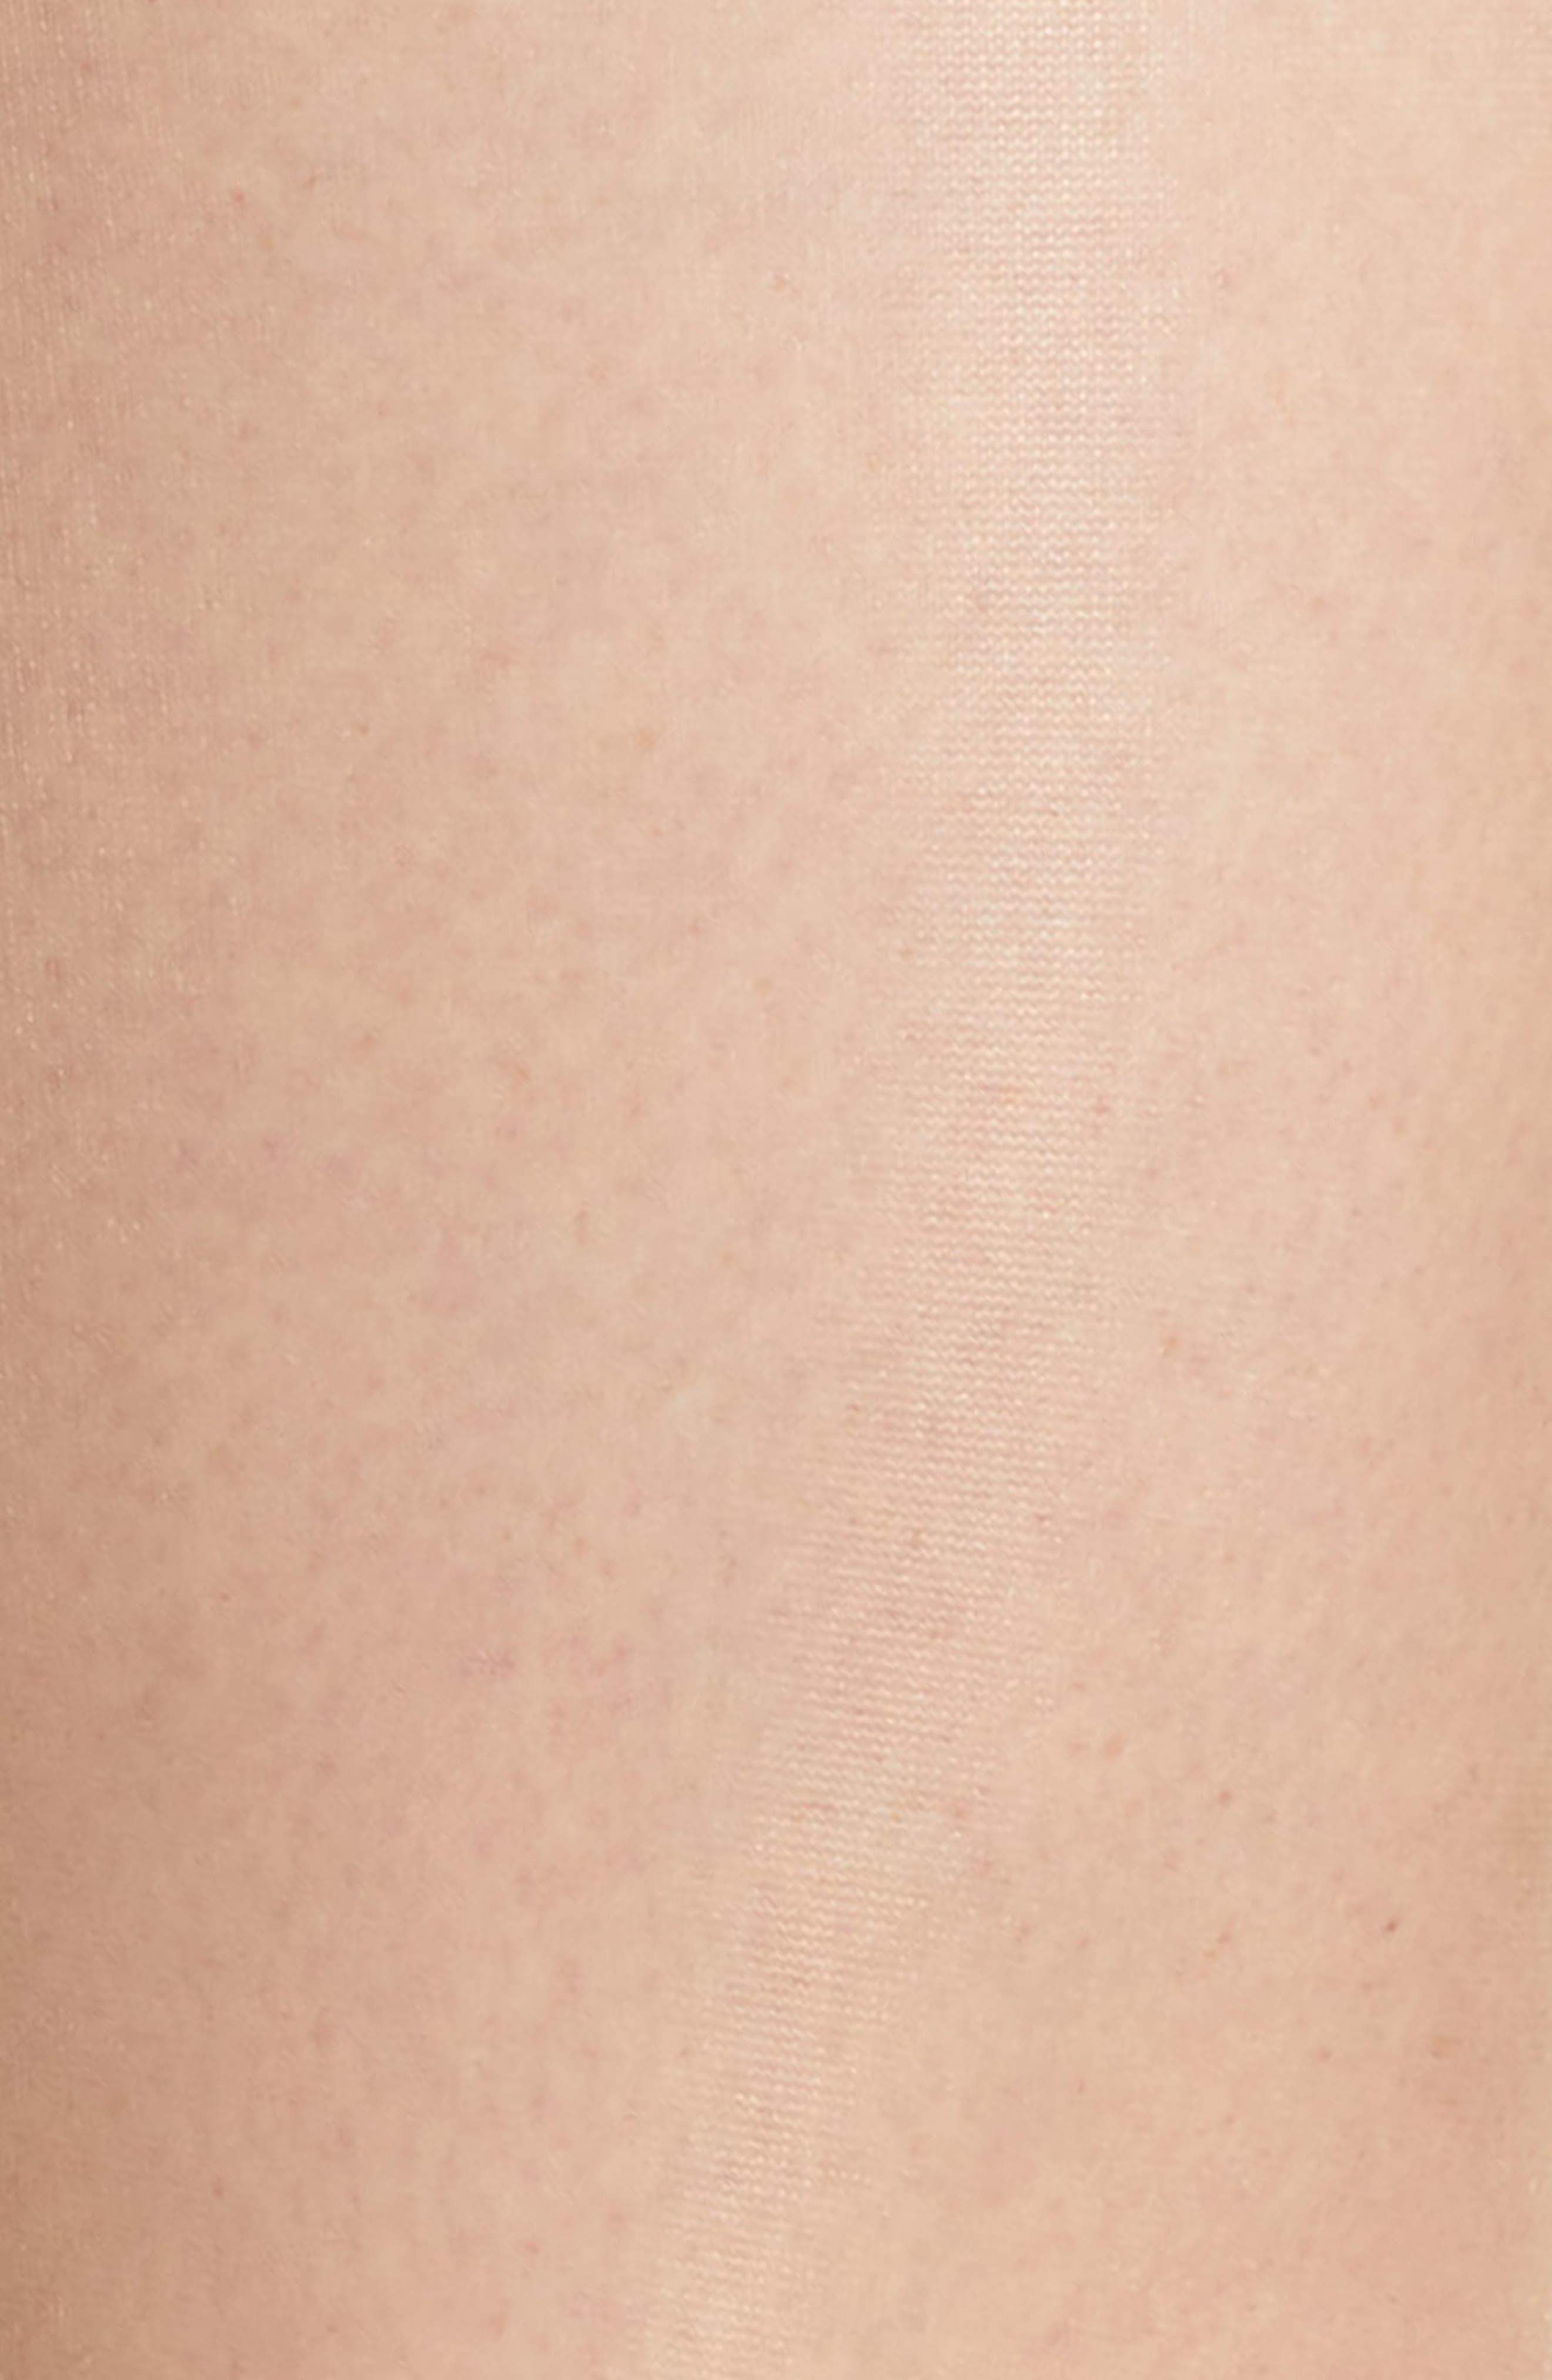 'Pure Matt 20' Stay-Up Stockings,                             Alternate thumbnail 9, color,